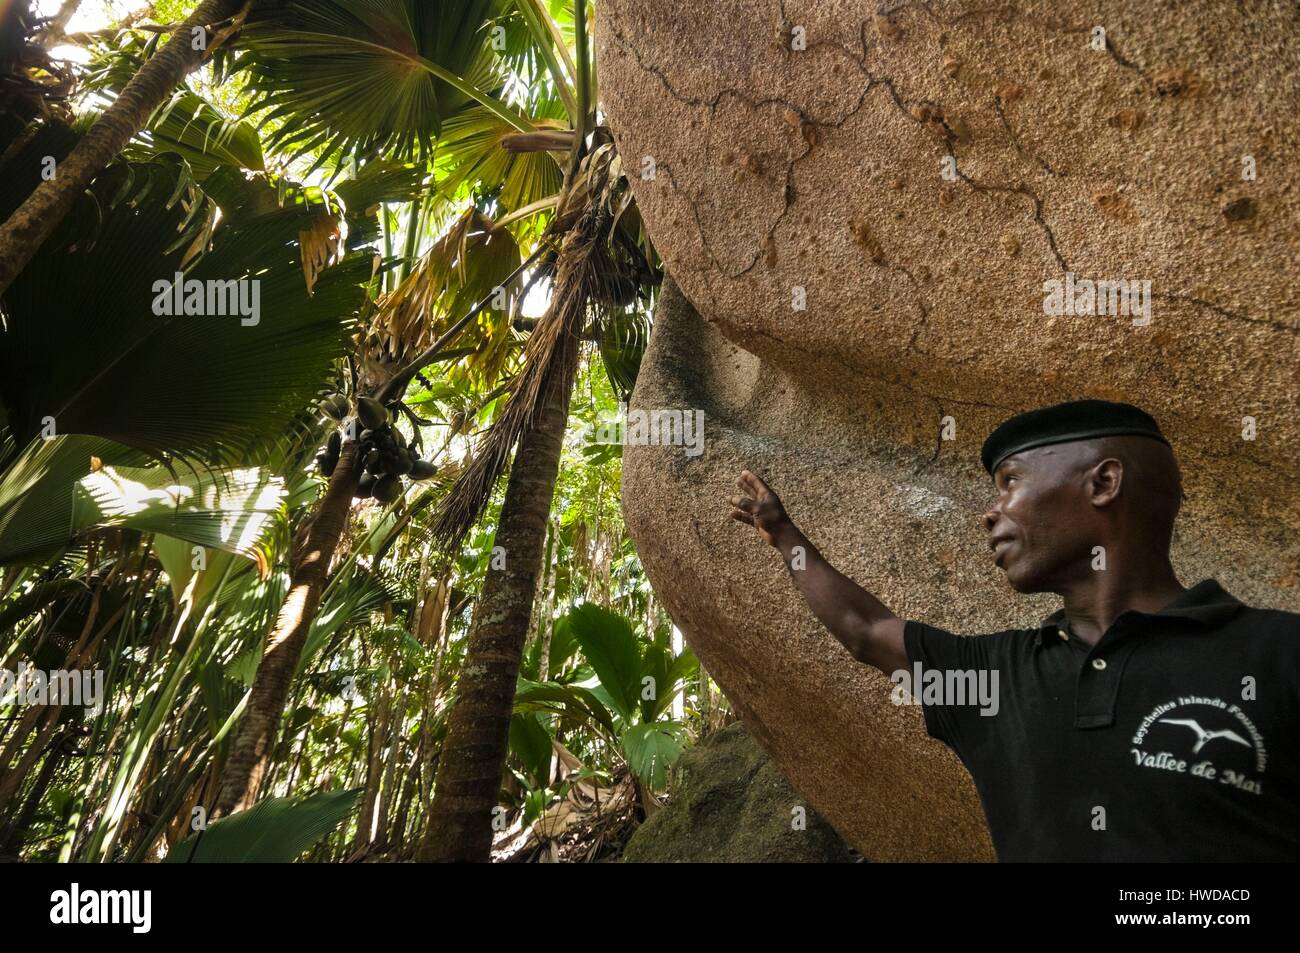 Seychelles,la Isla de Praslin, Vallée de Mai National Park, Patrimonio Mundial de la Unesco, el Ranger Andrea Imagen De Stock